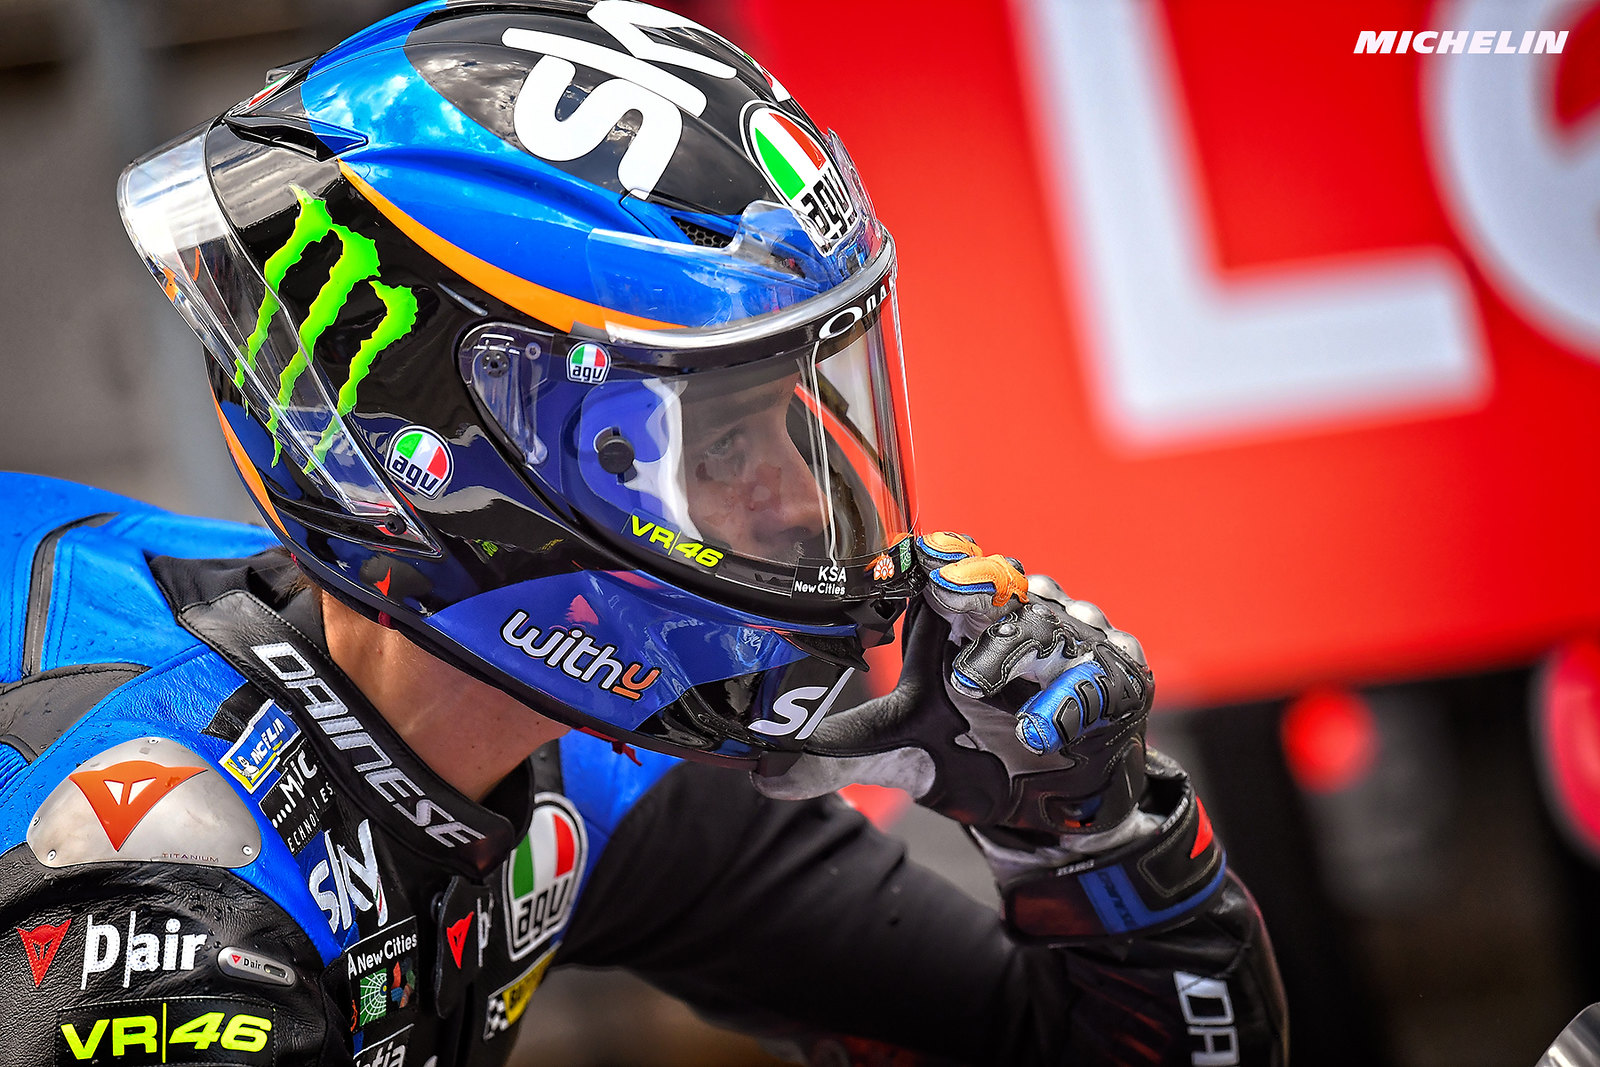 MotoGP2021オーストリアGP5位 ルカ・マリーニ「バイクを乗り換えない判断が功を奏した」